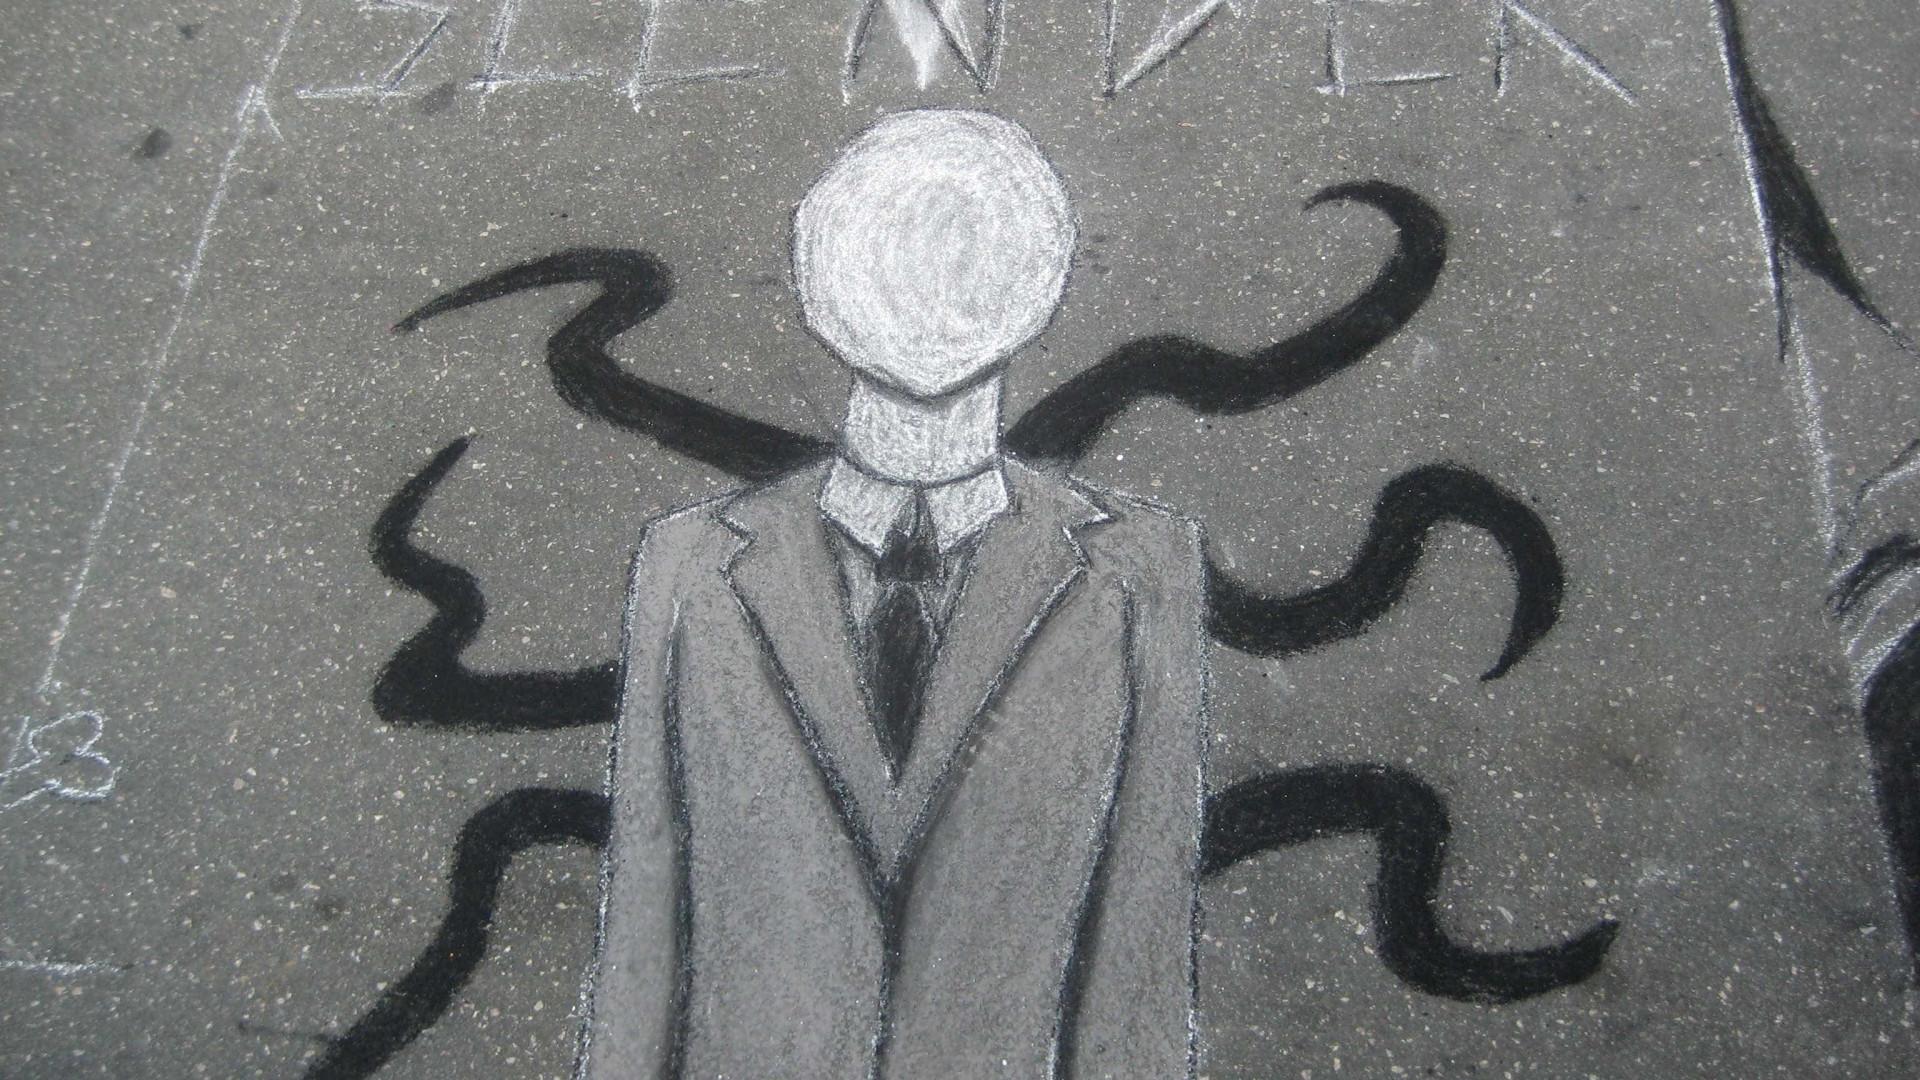 Slender Man: Ordenou esfaqueamento e foi considerada mentalmente incapaz